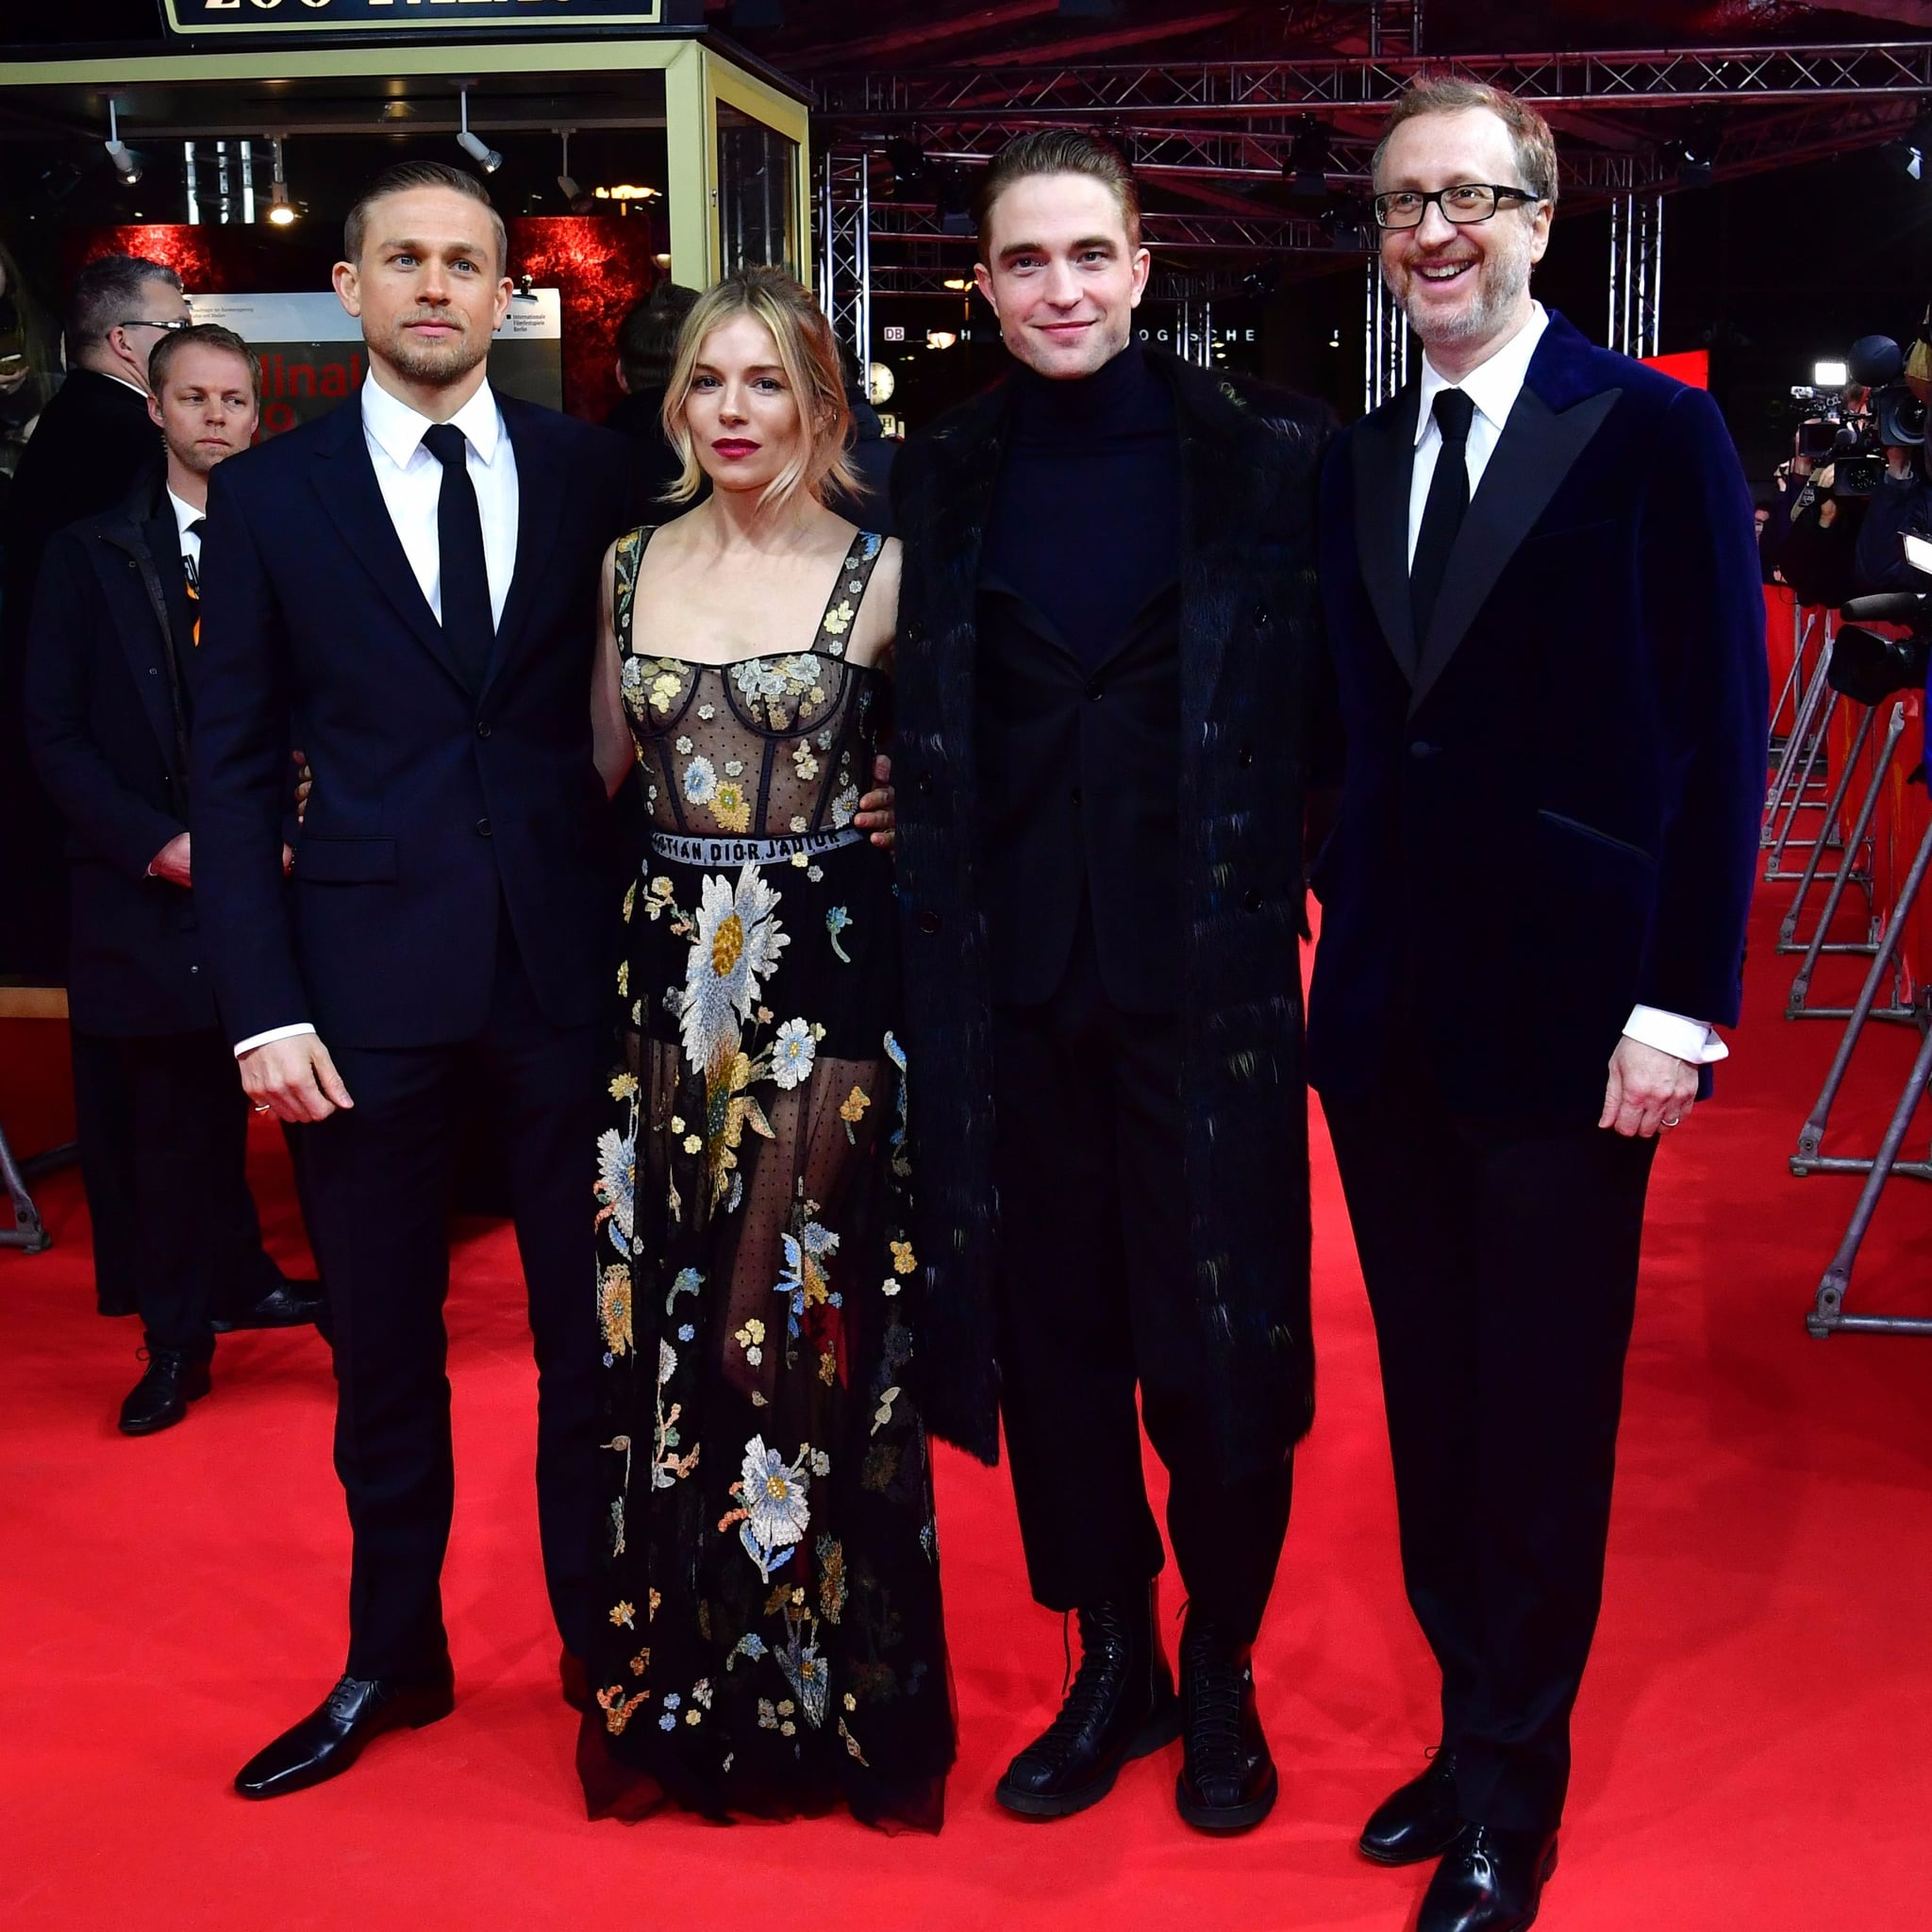 Robert Pattinson And Charlie Hunnam At Lost City Of Z Berlin Popsugar Celebrity